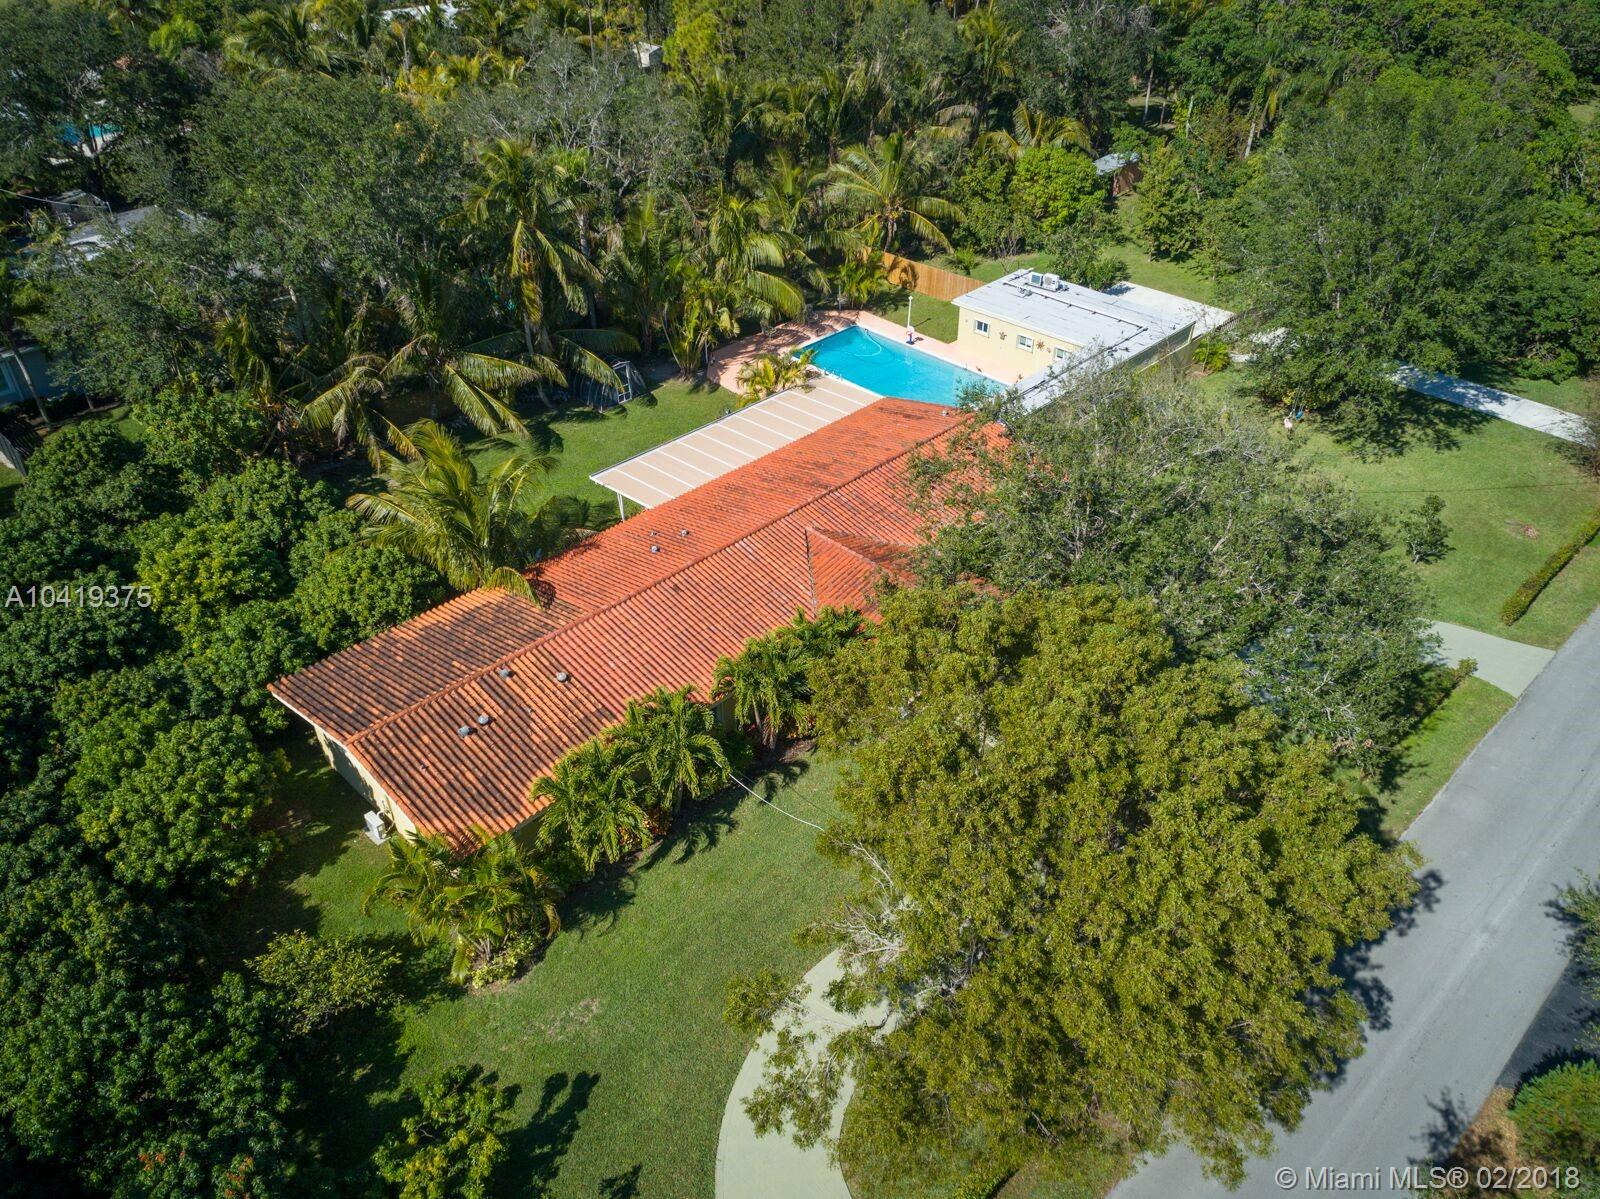 7540 Sw 71st Ave, Miami FL, 33143